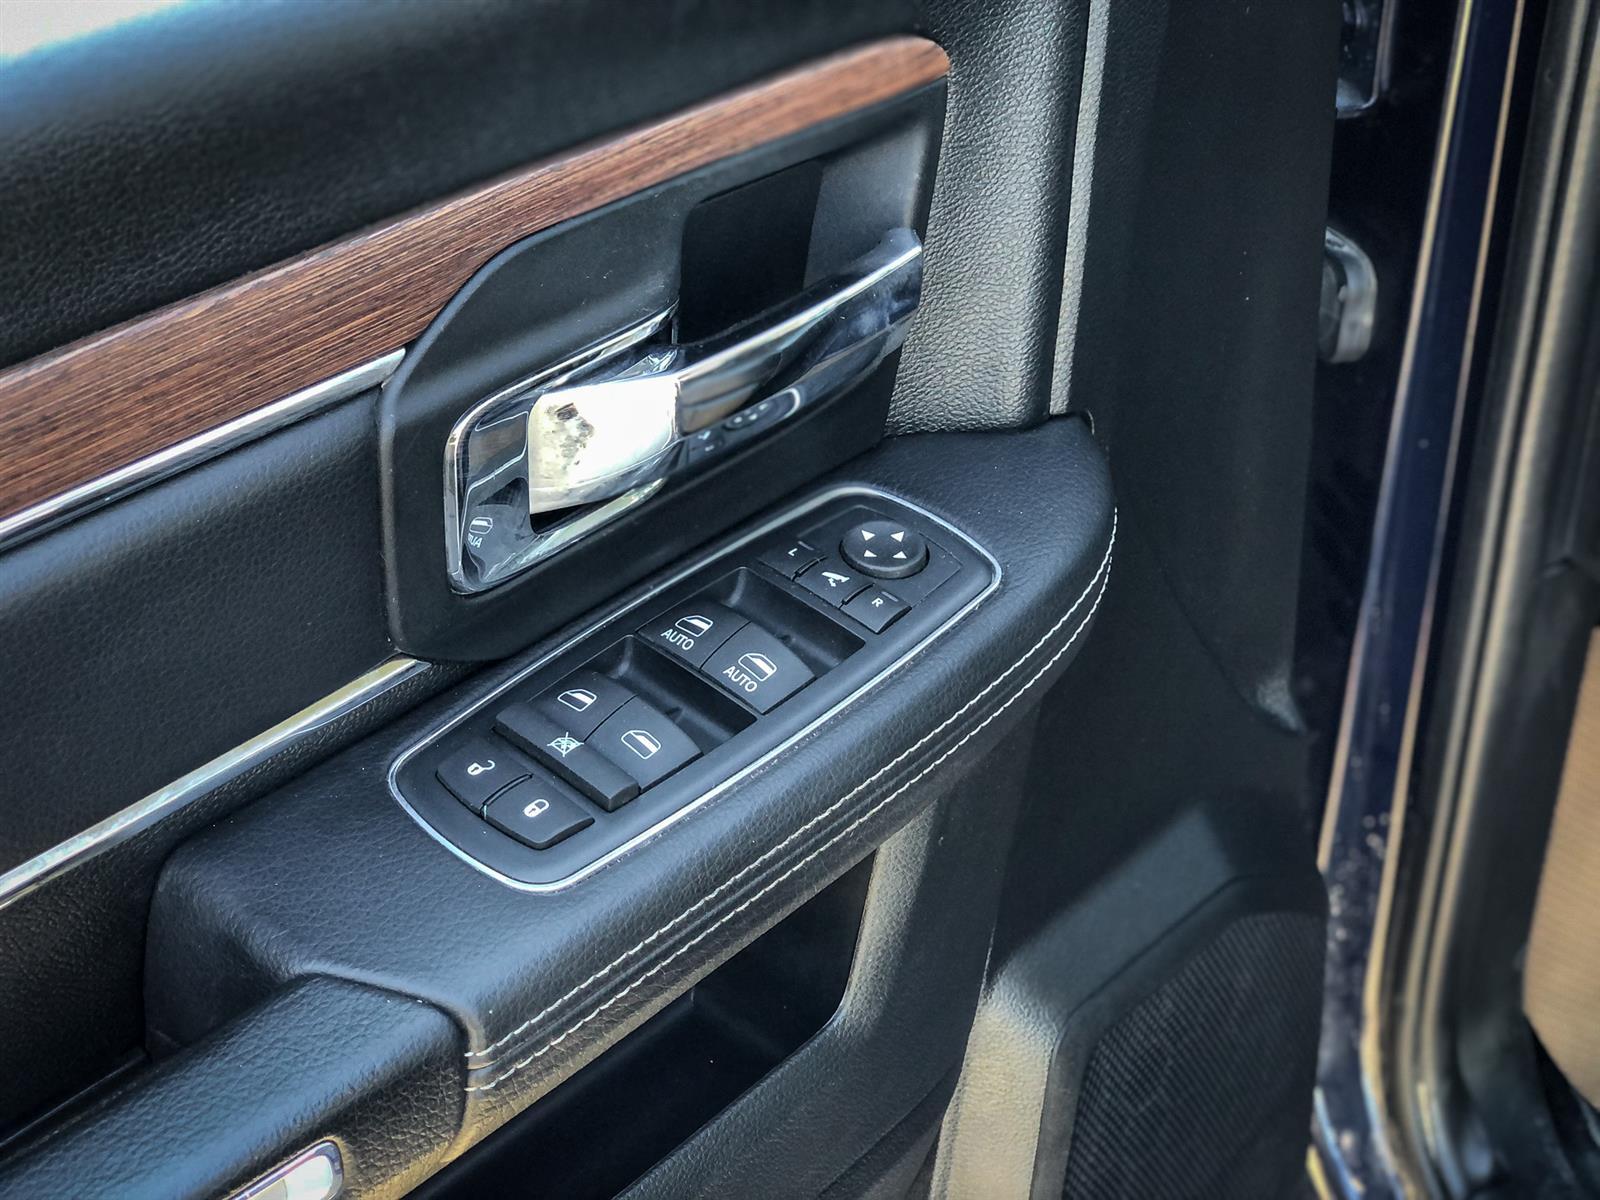 2016 Ram 1500 LARAMIE | 5.7L V8 | 4X4 | HEATED SEATS | SUNROOF